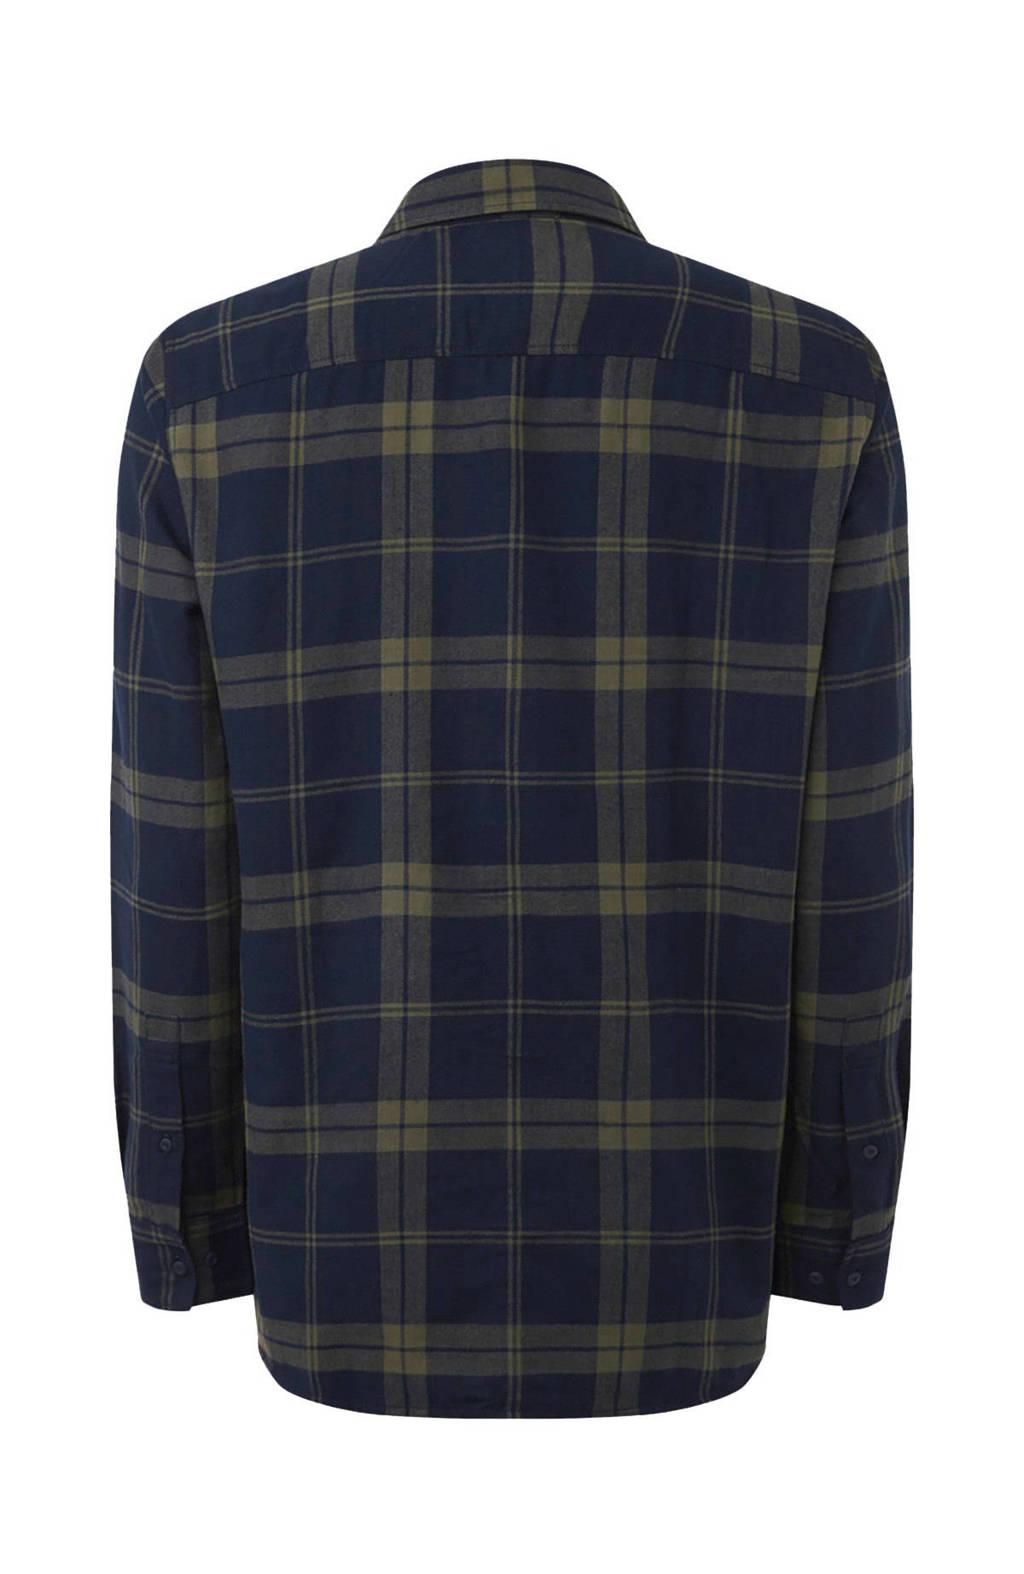 O'Neill geruit overhemd donkerblauw/kaki, GREEN AOP